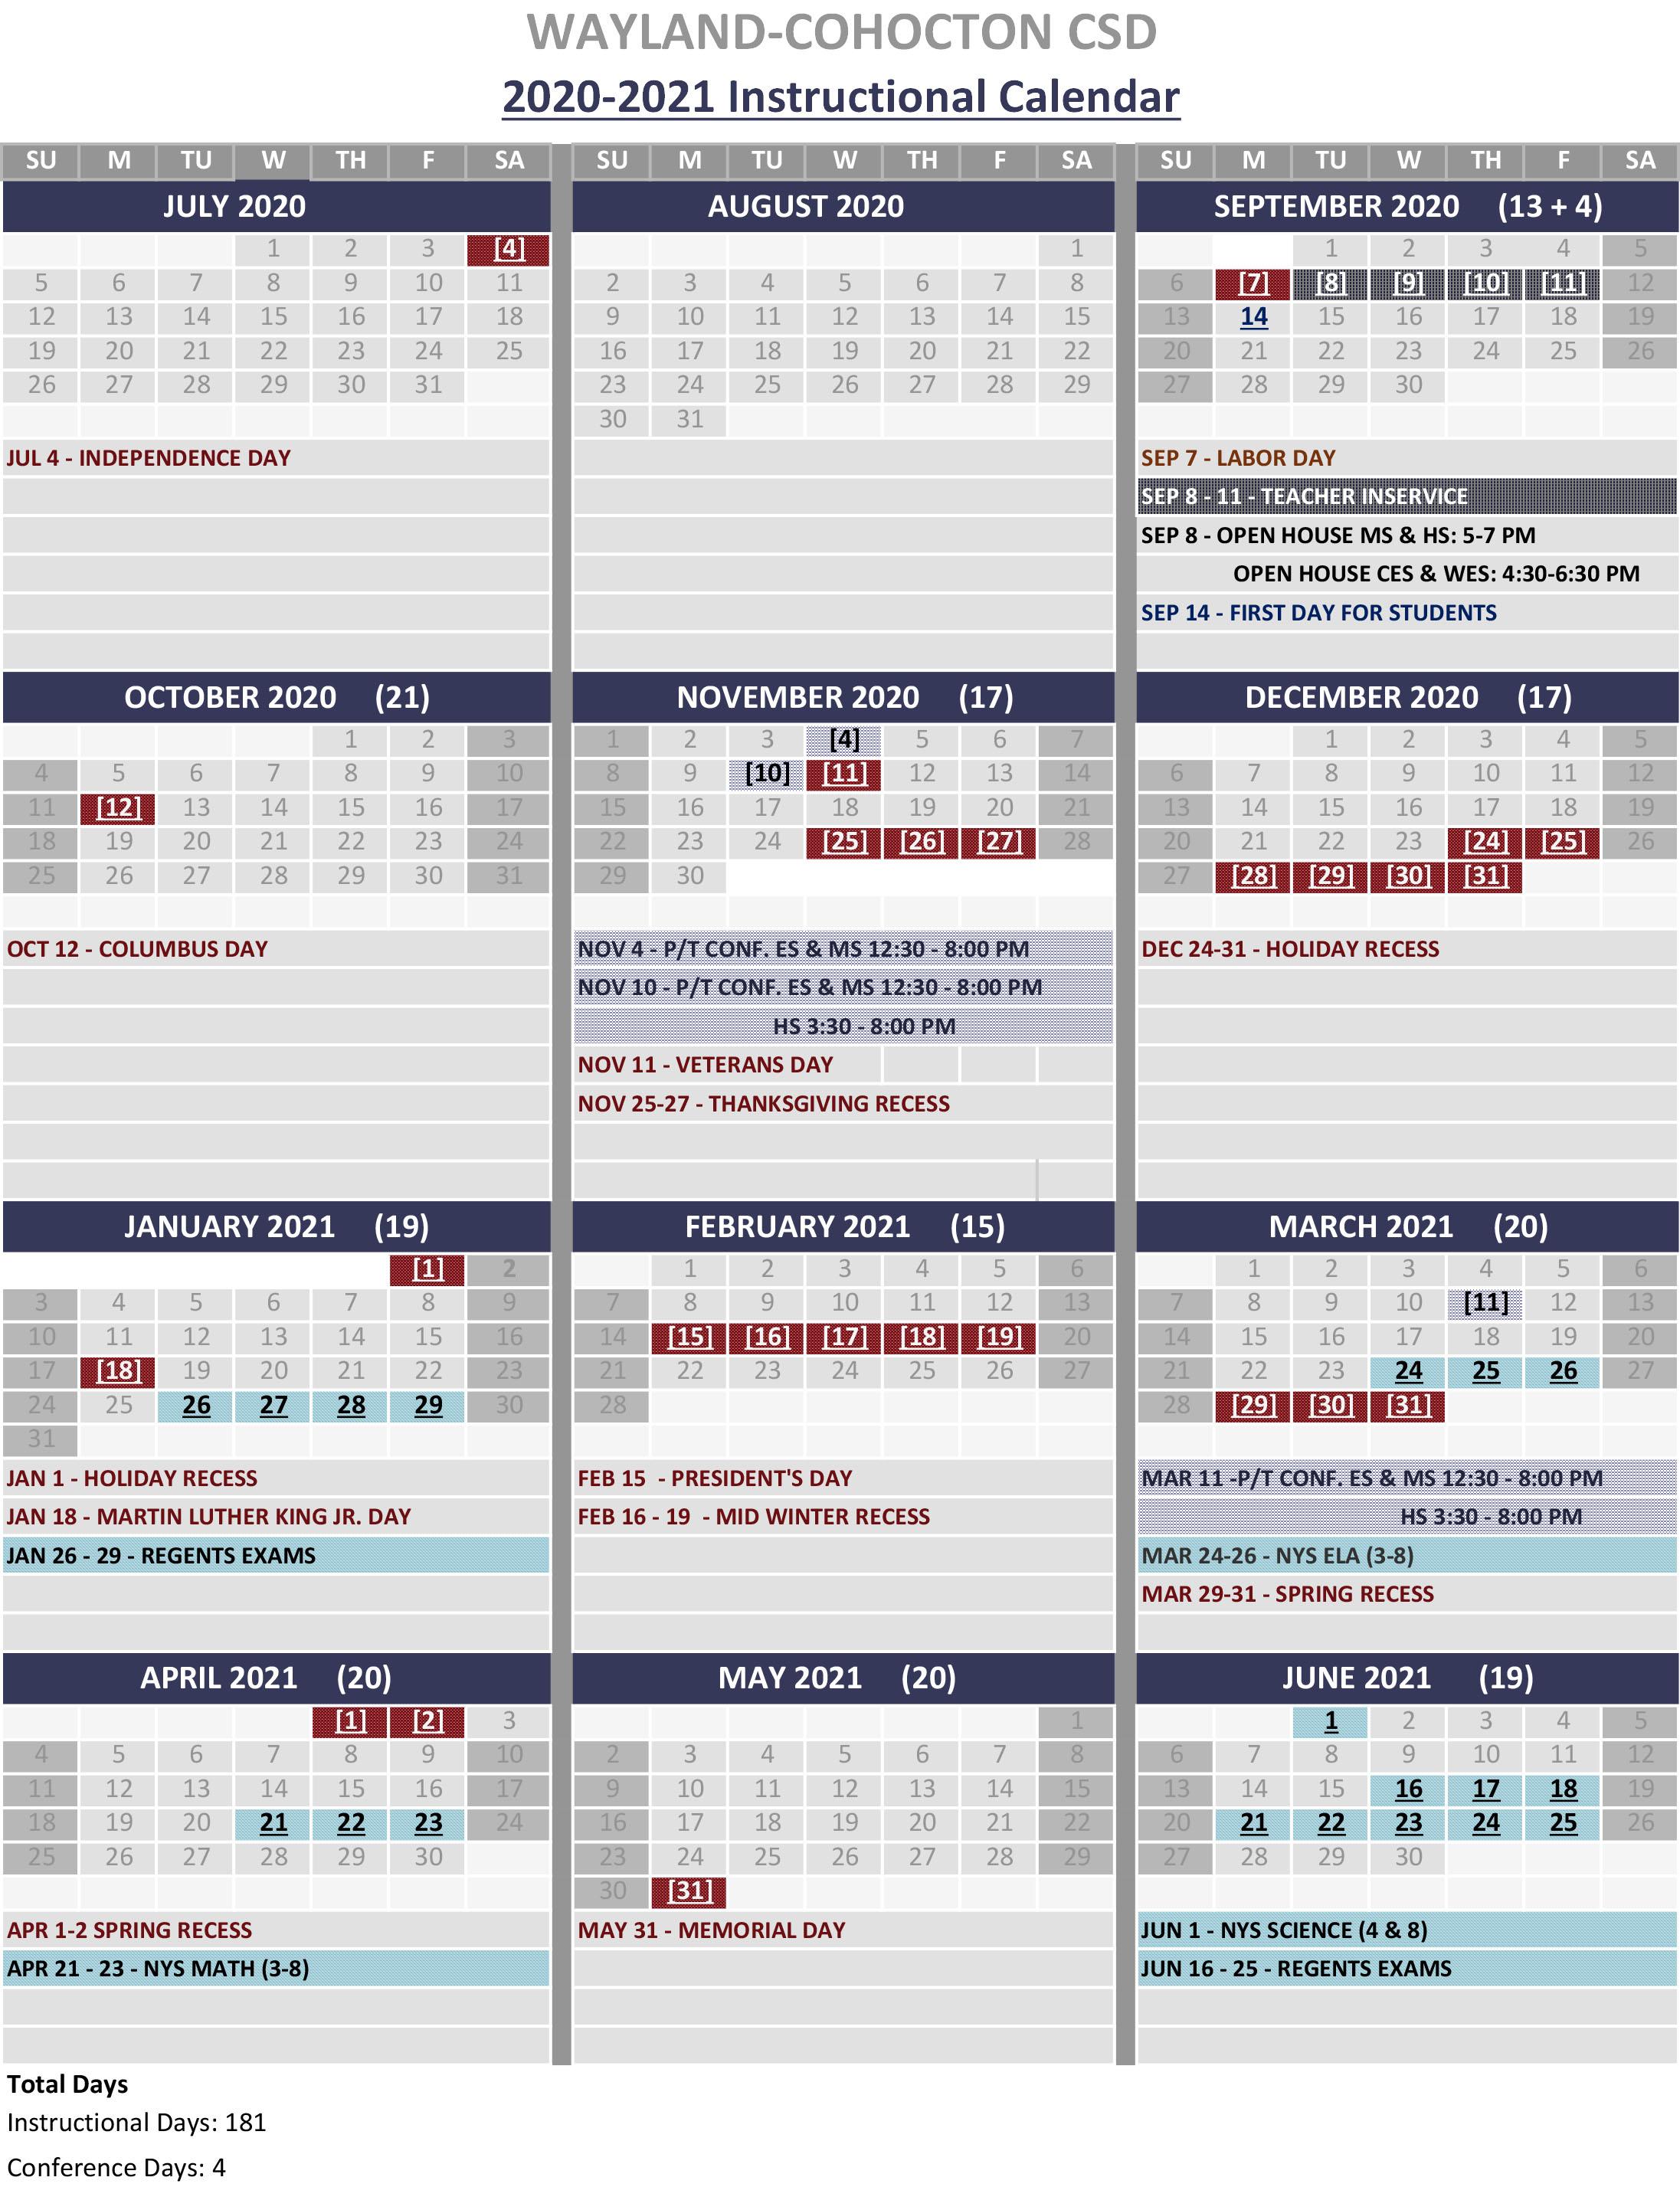 2020 - 2021 Instructional Calendar